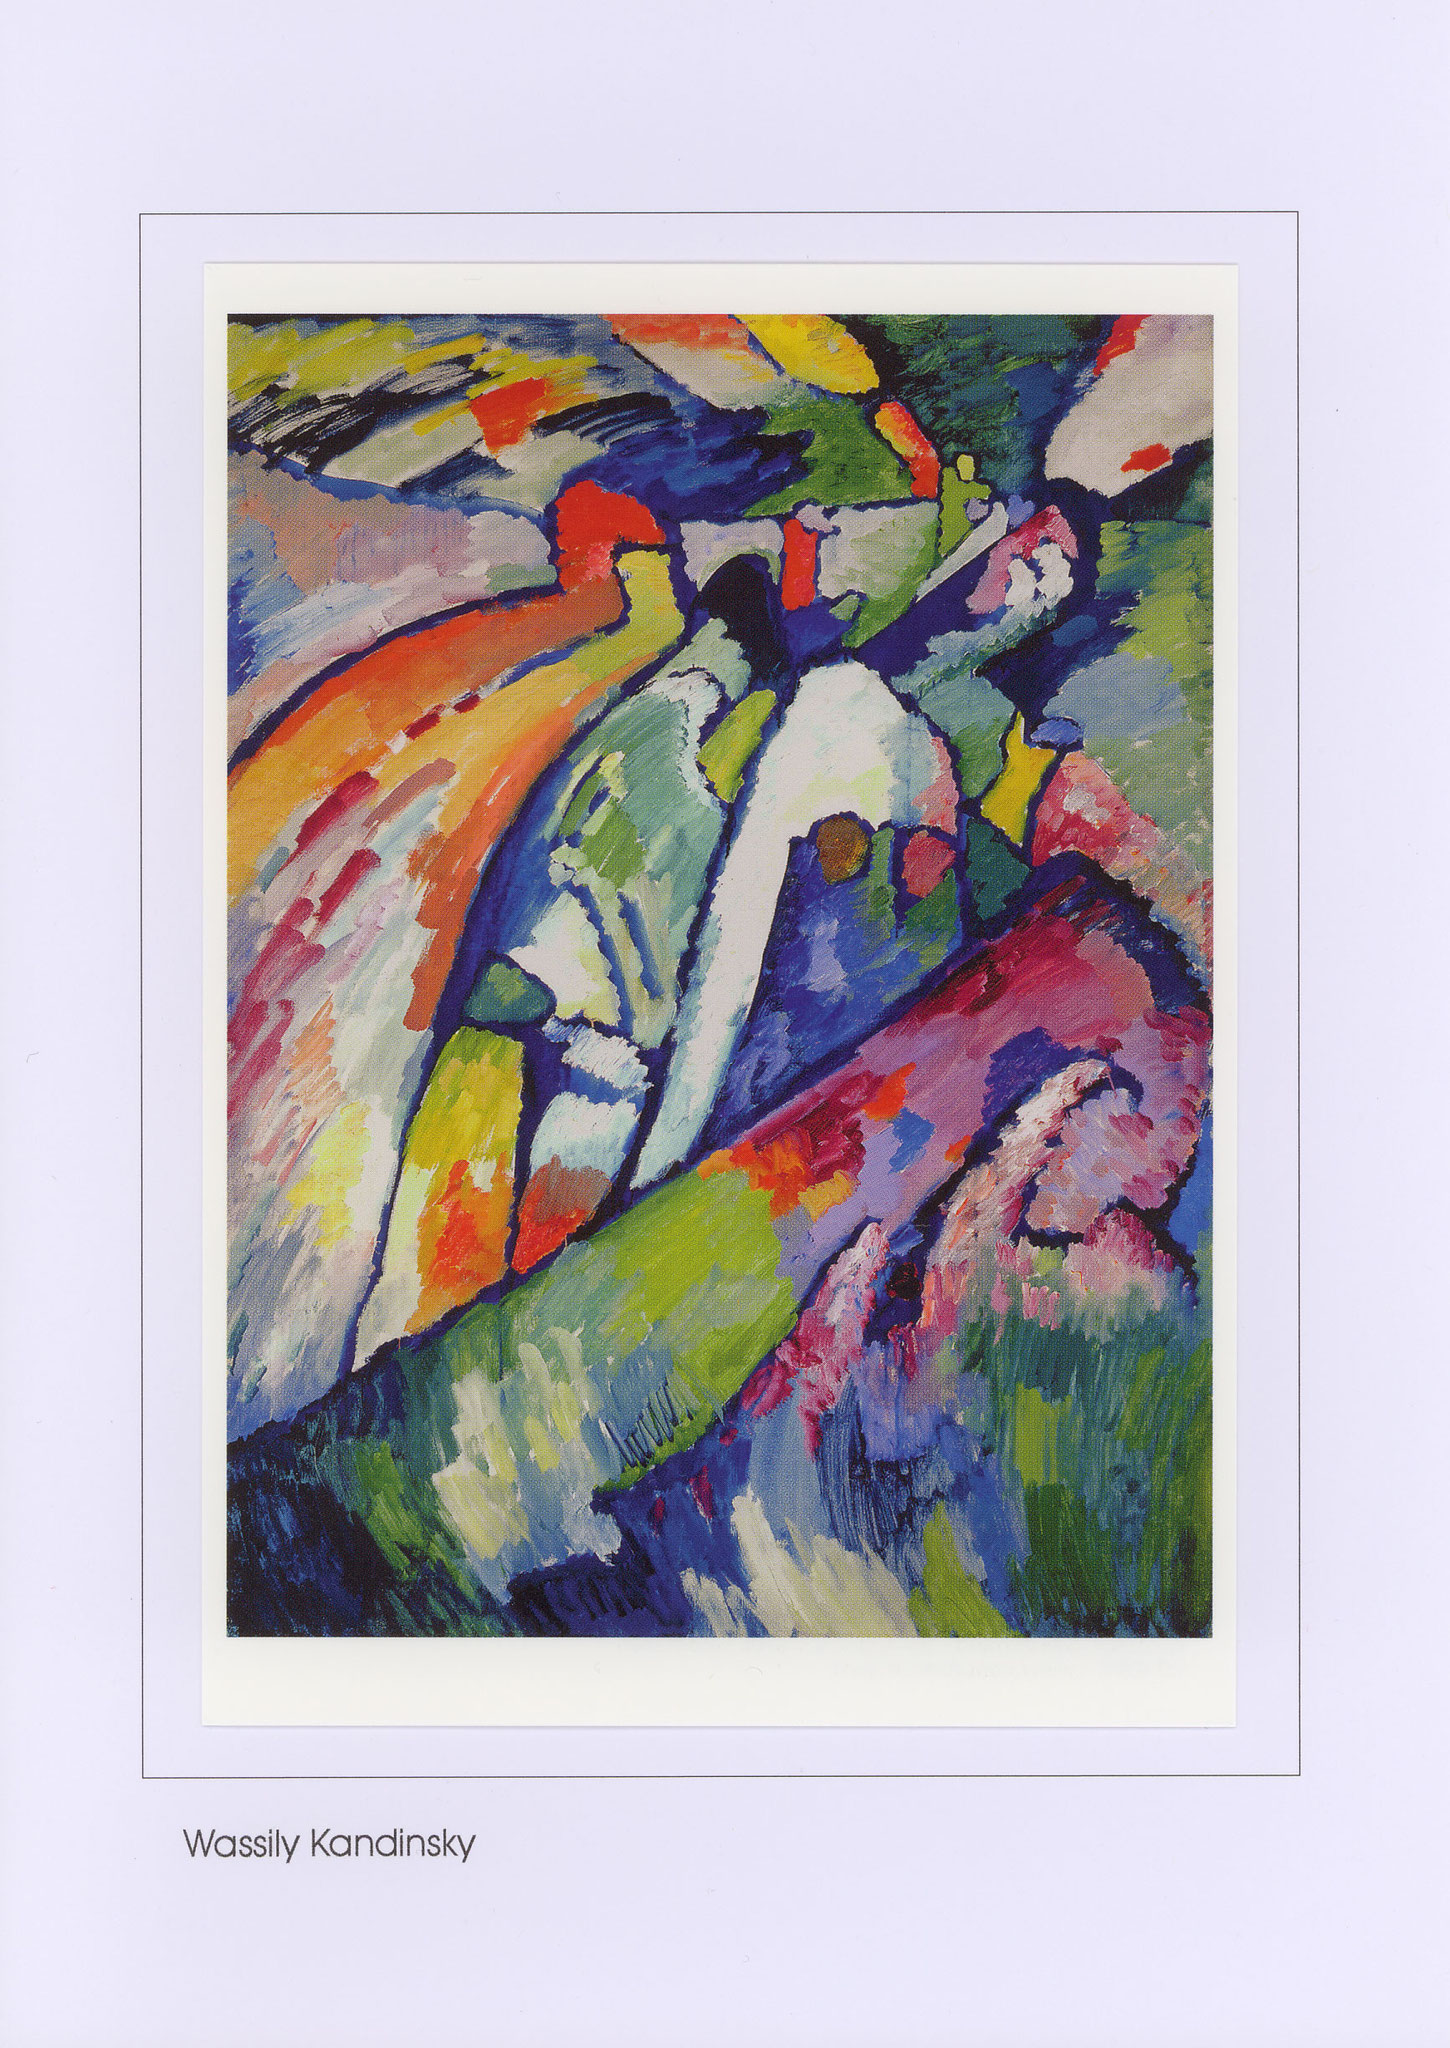 Nr. 0/110 Wassily Kandinsky, Improvisation 7 (Sturm), 1910